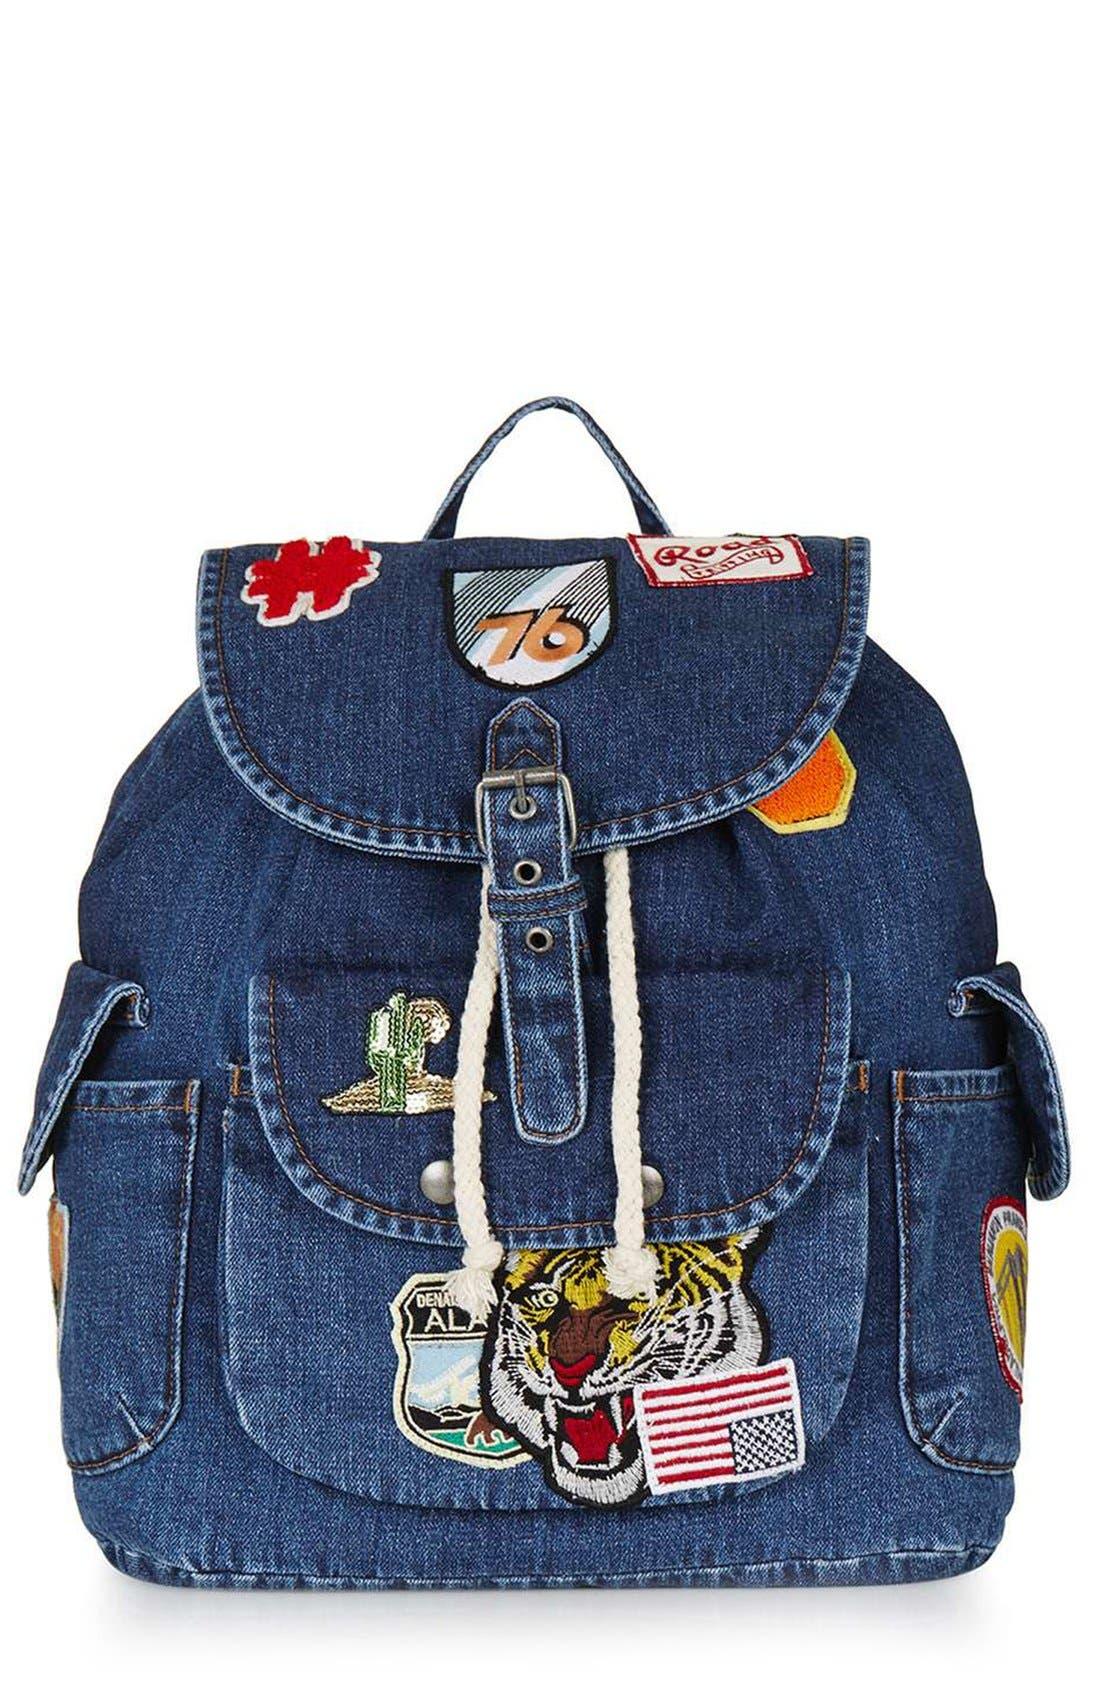 Alternate Image 1 Selected - Topshop Badge Denim Backpack